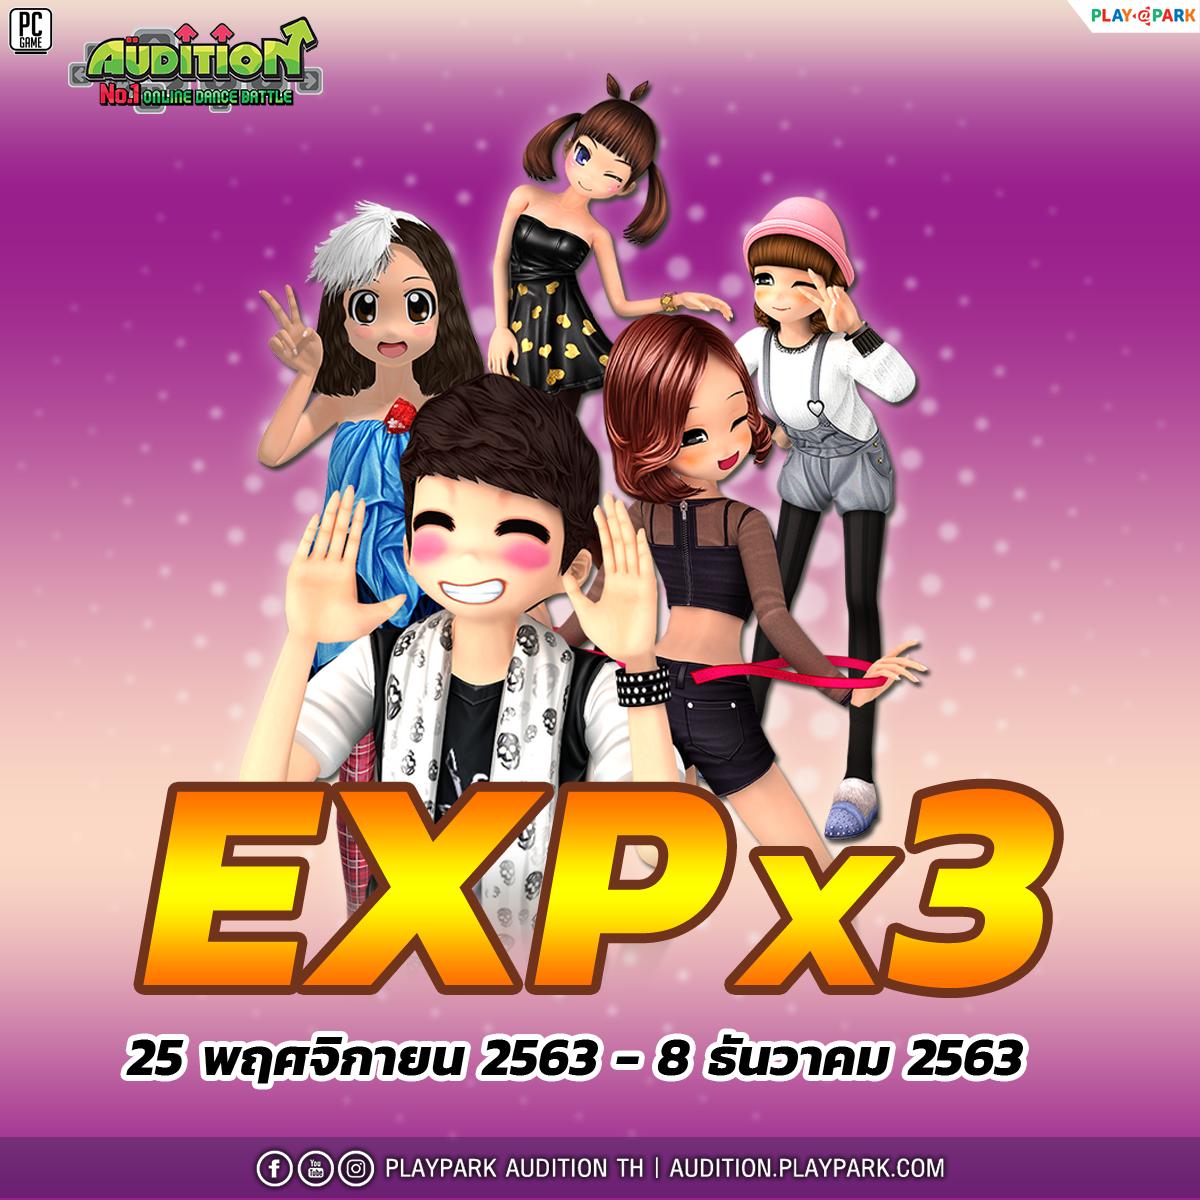 [AUDITION14th] 25 พฤศจิกายนนี้ อัปเดตเพลงใหม่, Exp x3 และไอเทมใหม่อีกมากมาย !!